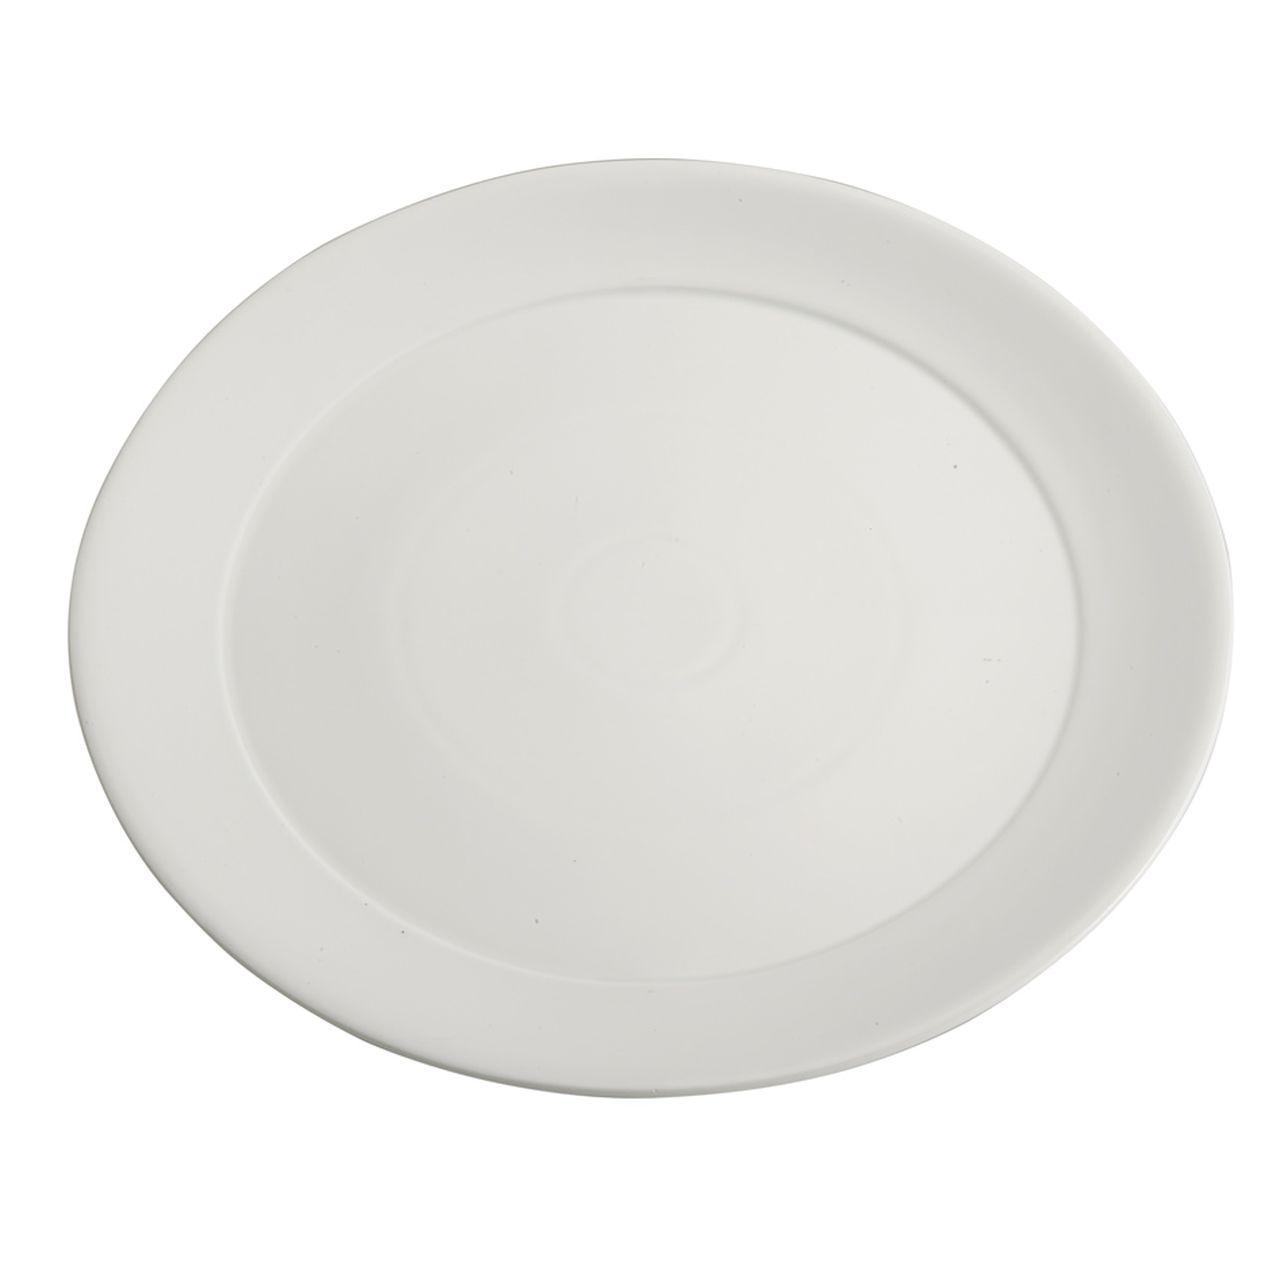 Piatto vassoio in porcellana bianca tondo con falda larga